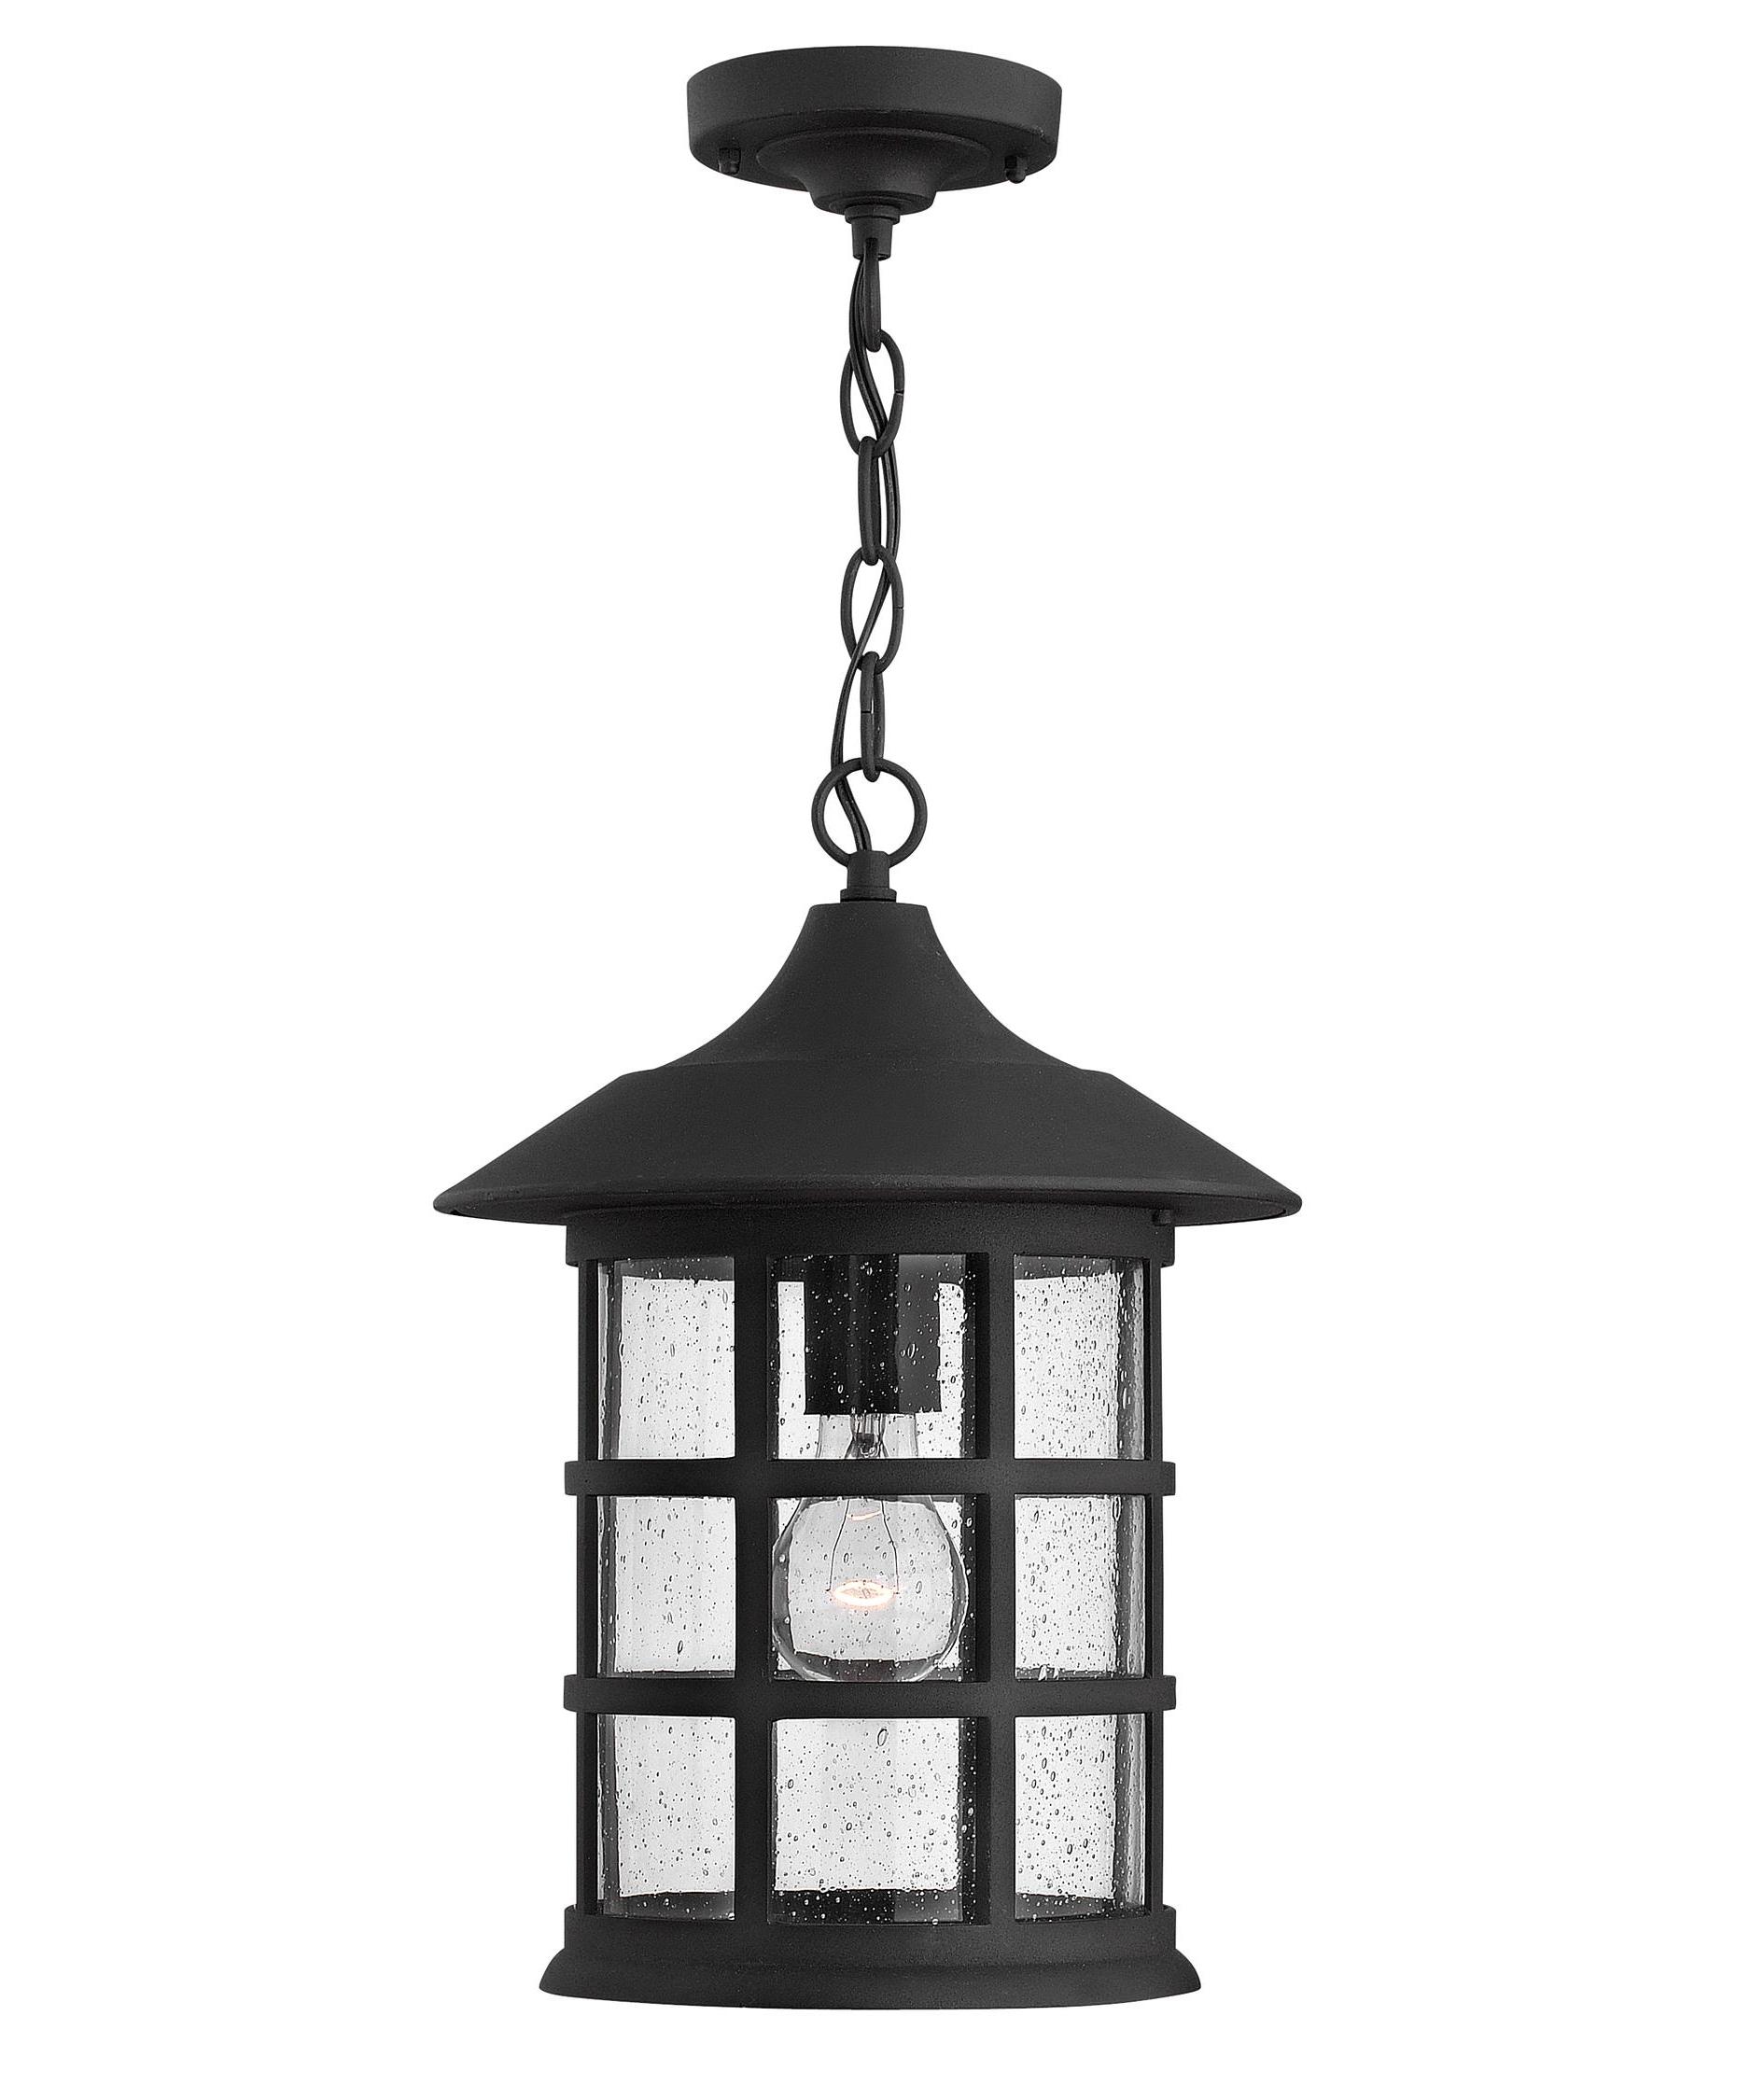 Best And Newest Hinkley Lighting 1802 Freeport 10 Inch Wide 1 Light Outdoor Hanging Regarding White Outdoor Hanging Lights (Gallery 9 of 20)